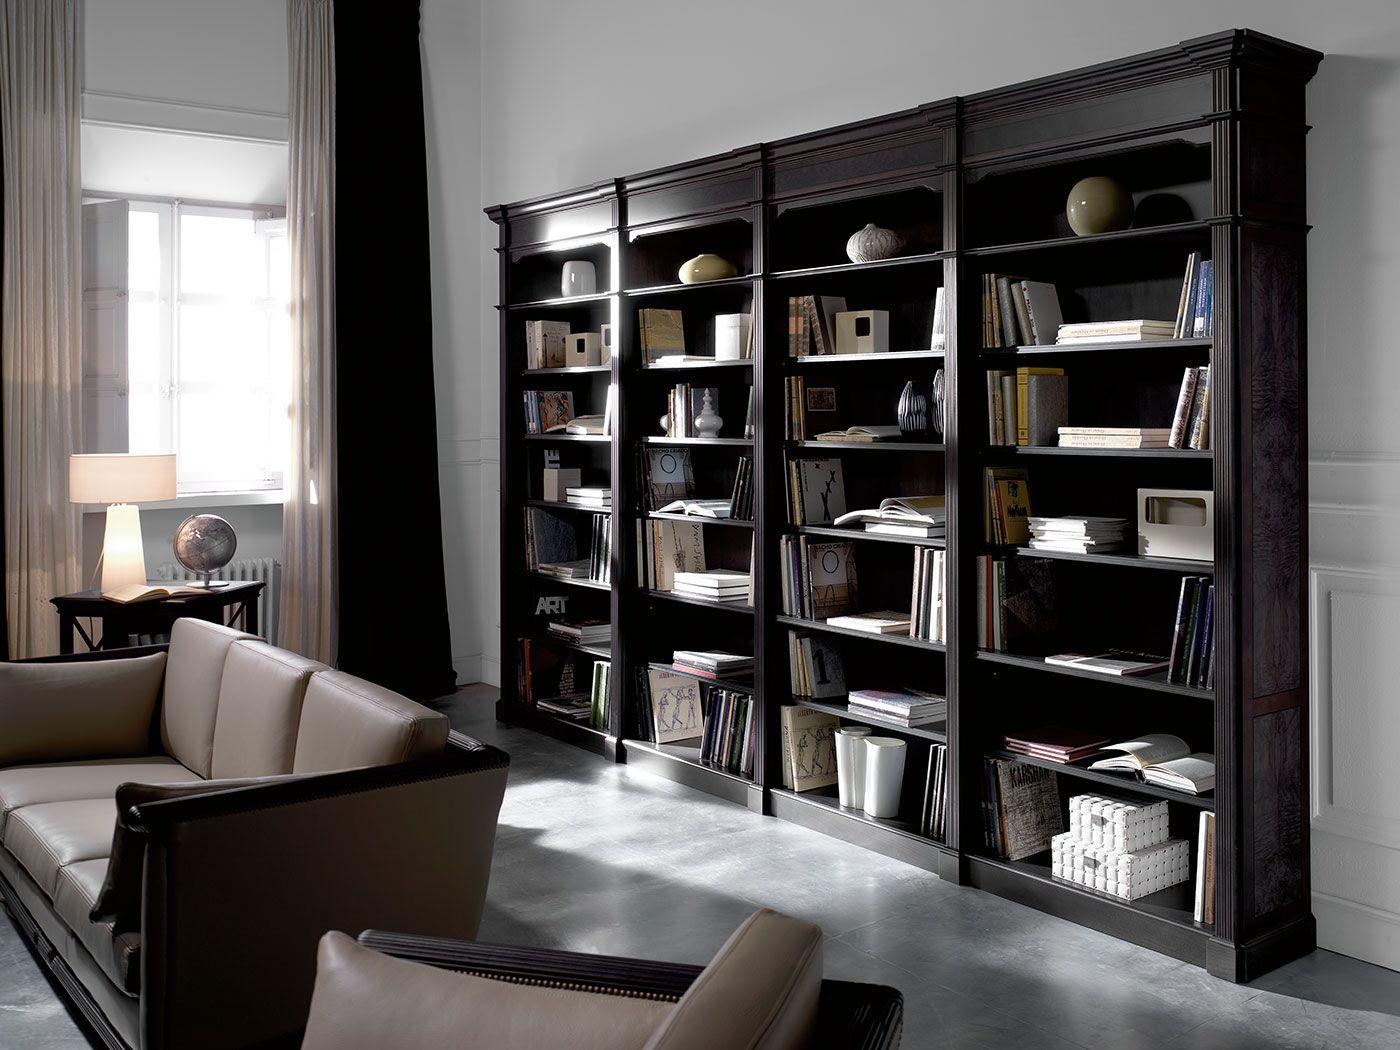 Muebles cl sicos de oficina de la serie art moble con for Muebles de oficina clasicos